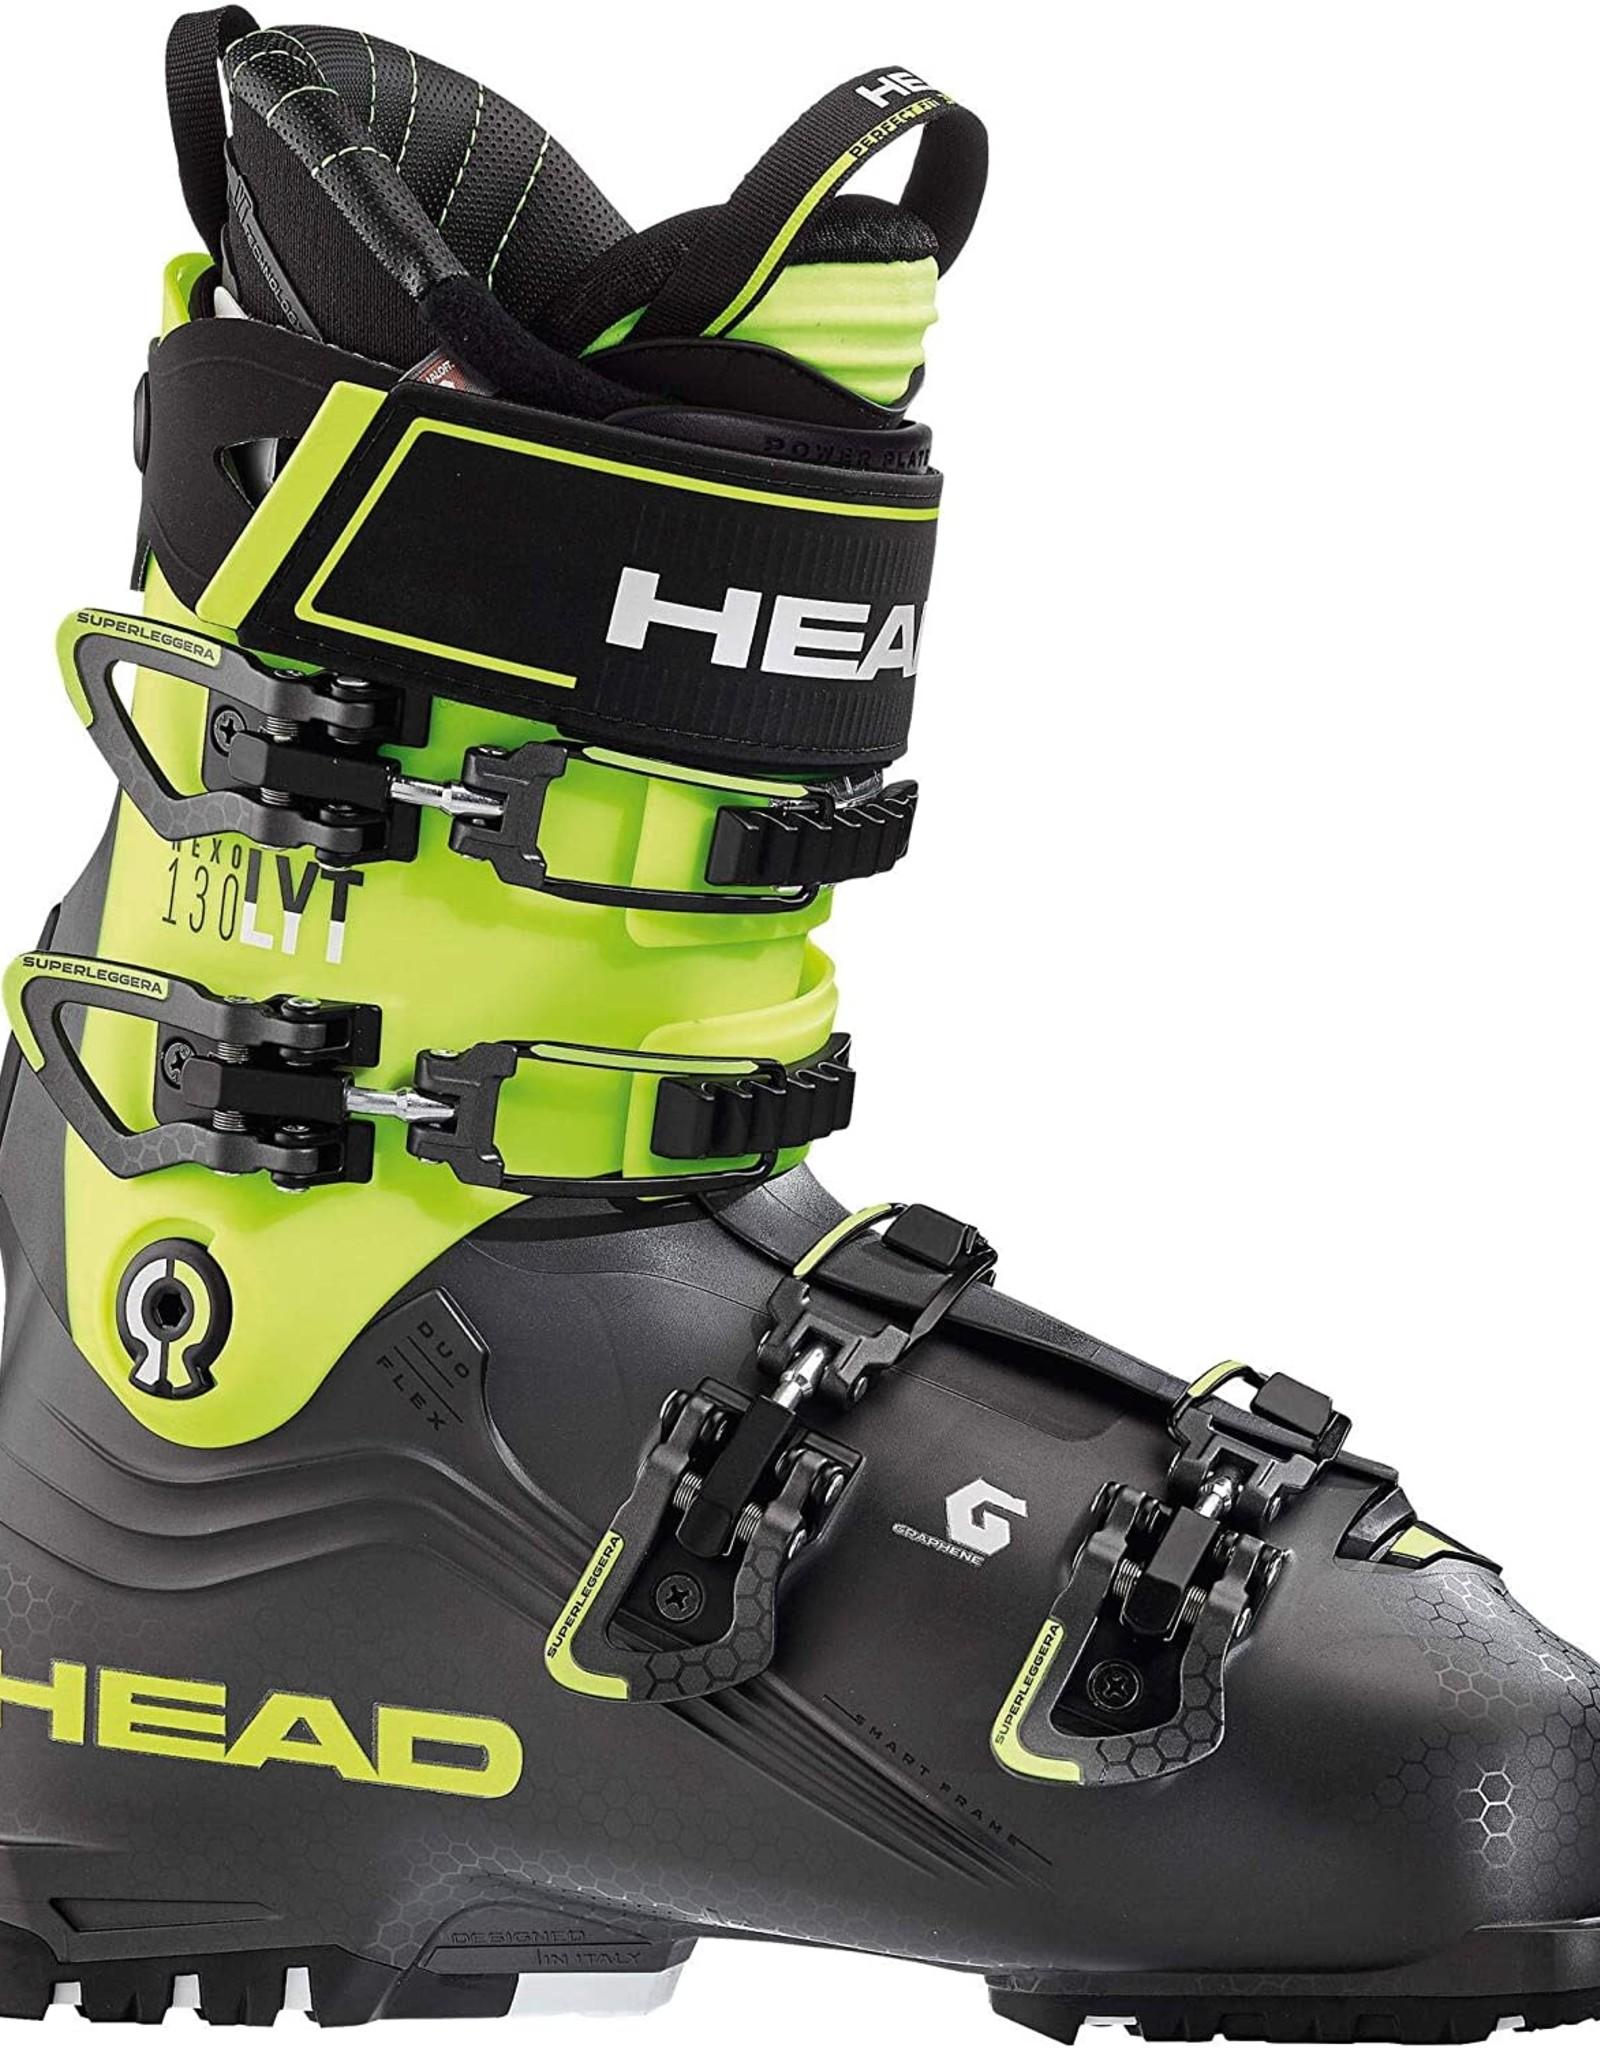 HEAD HEAD Ski Boots NEXO LYT 130 (19/20)